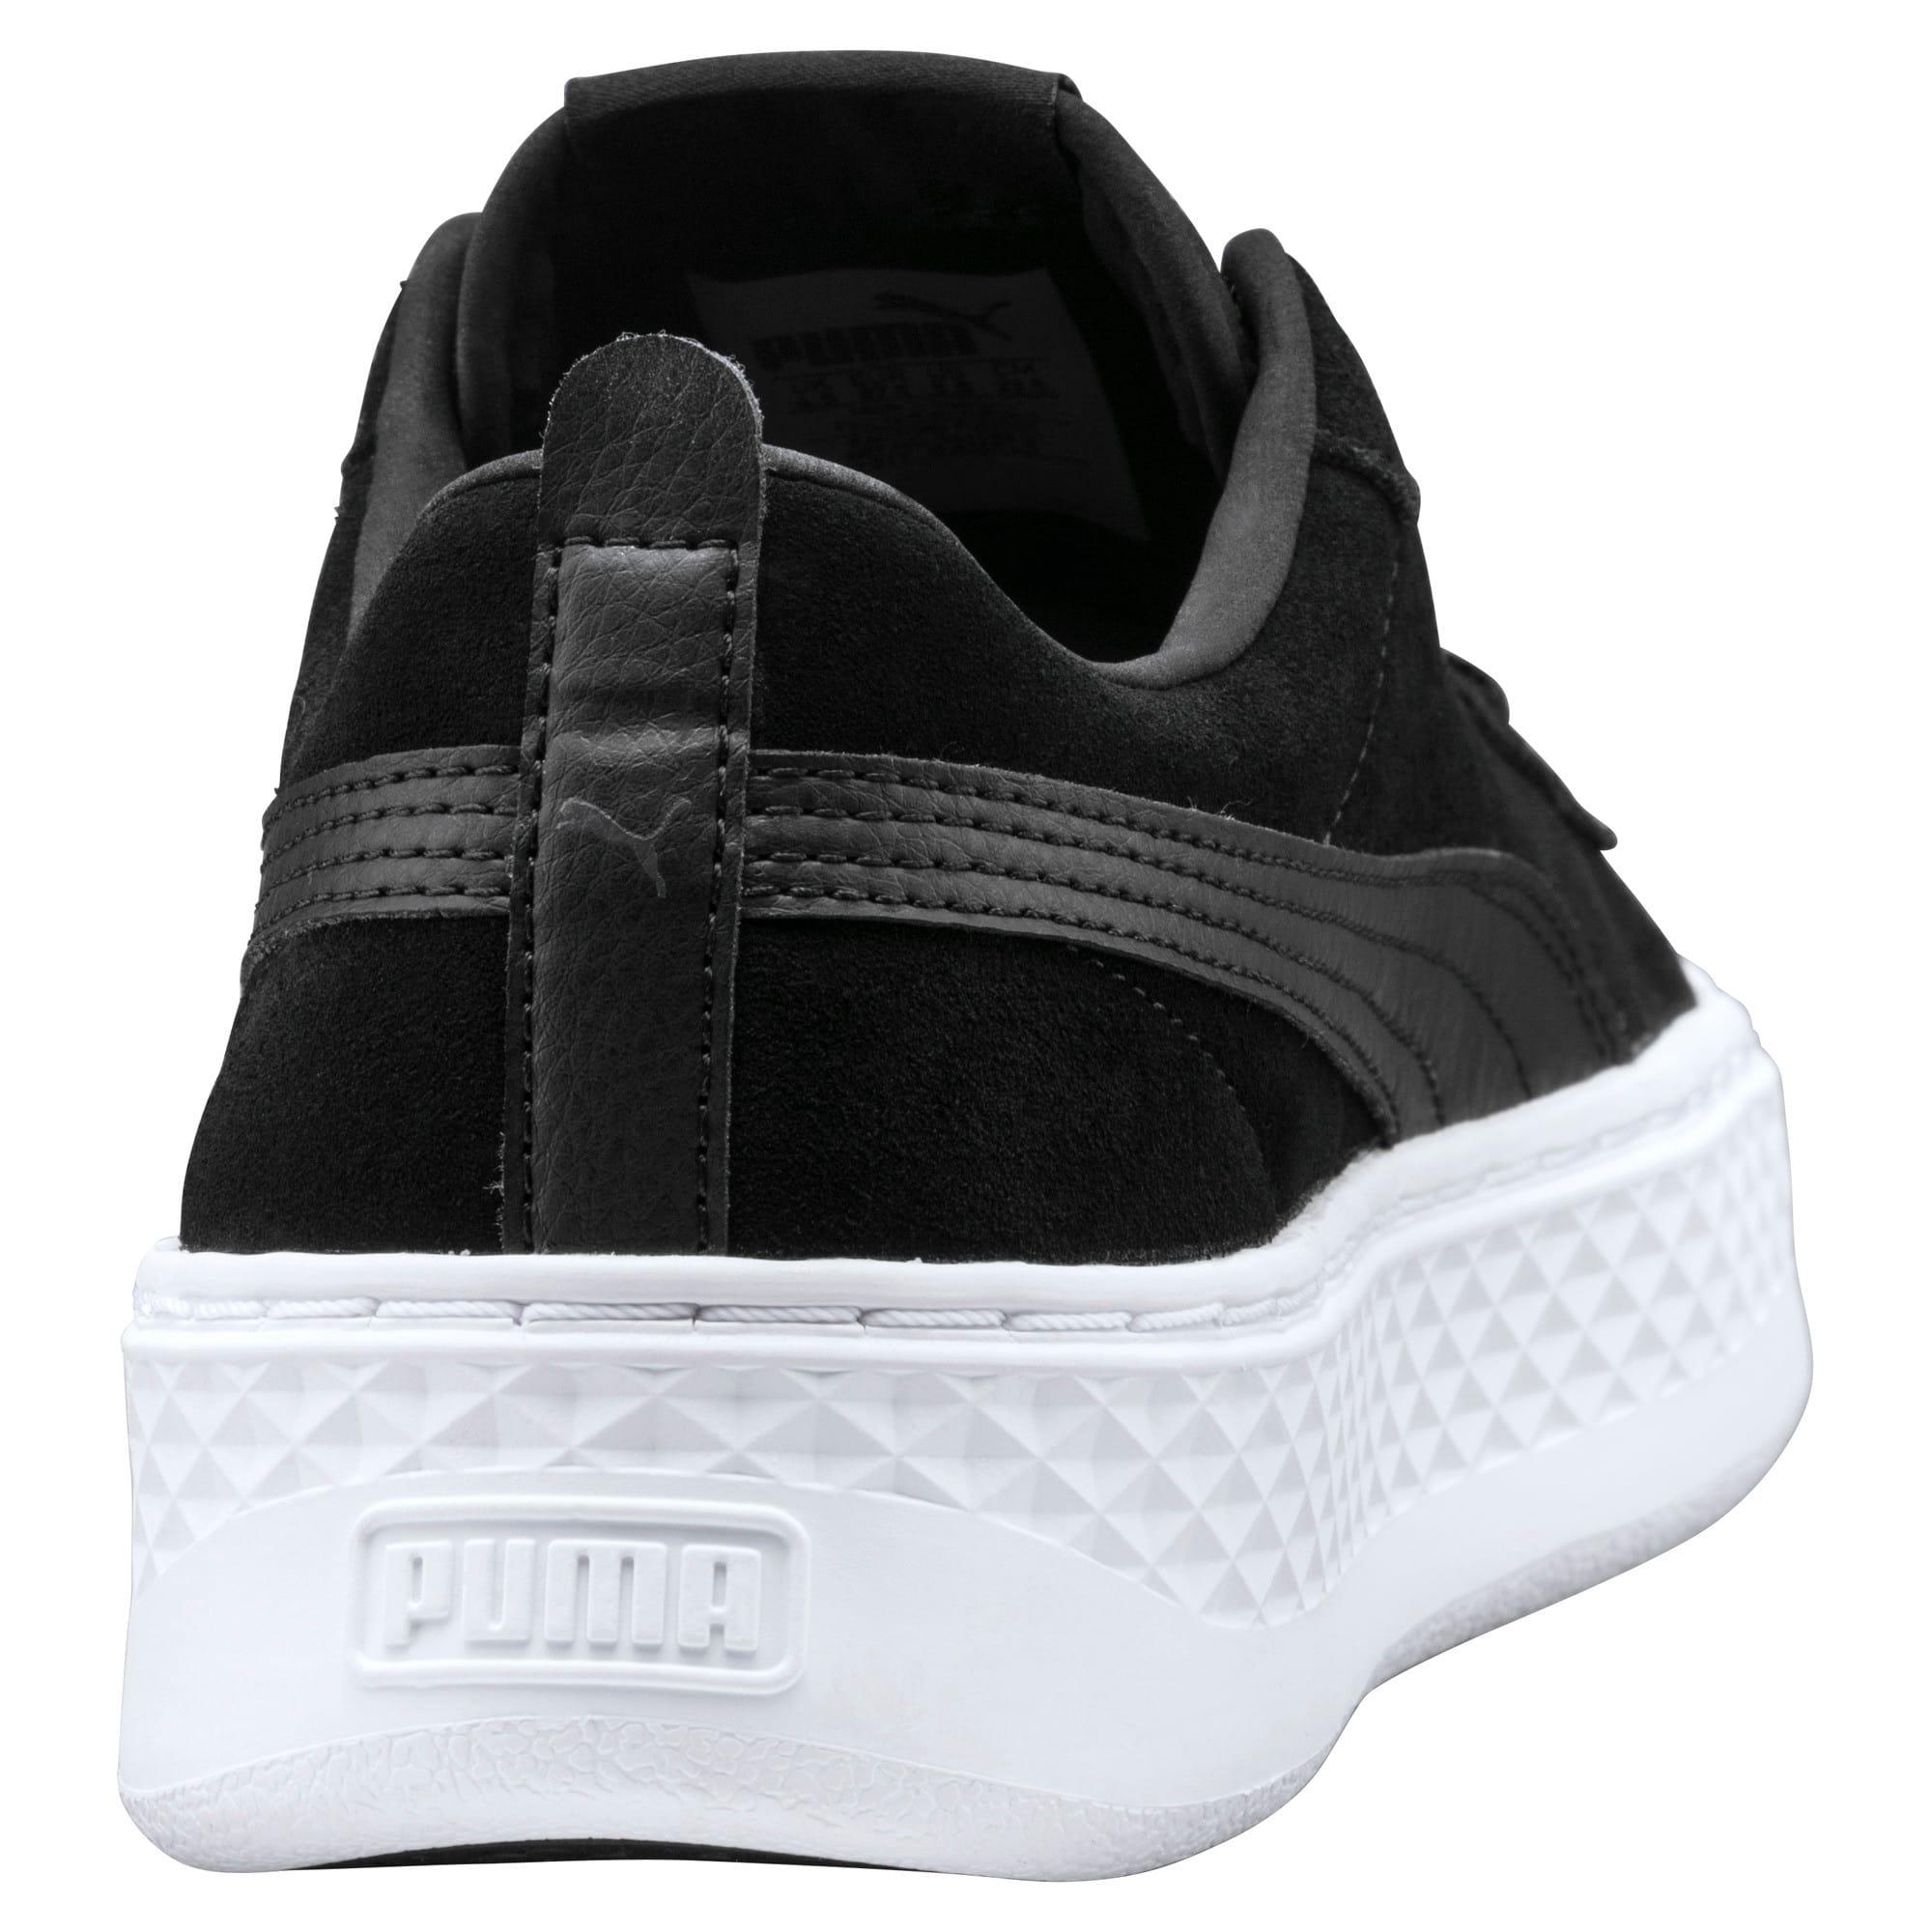 Thumbnail 3 of Puma Smash Platform SD, Puma Black-Puma Black, medium